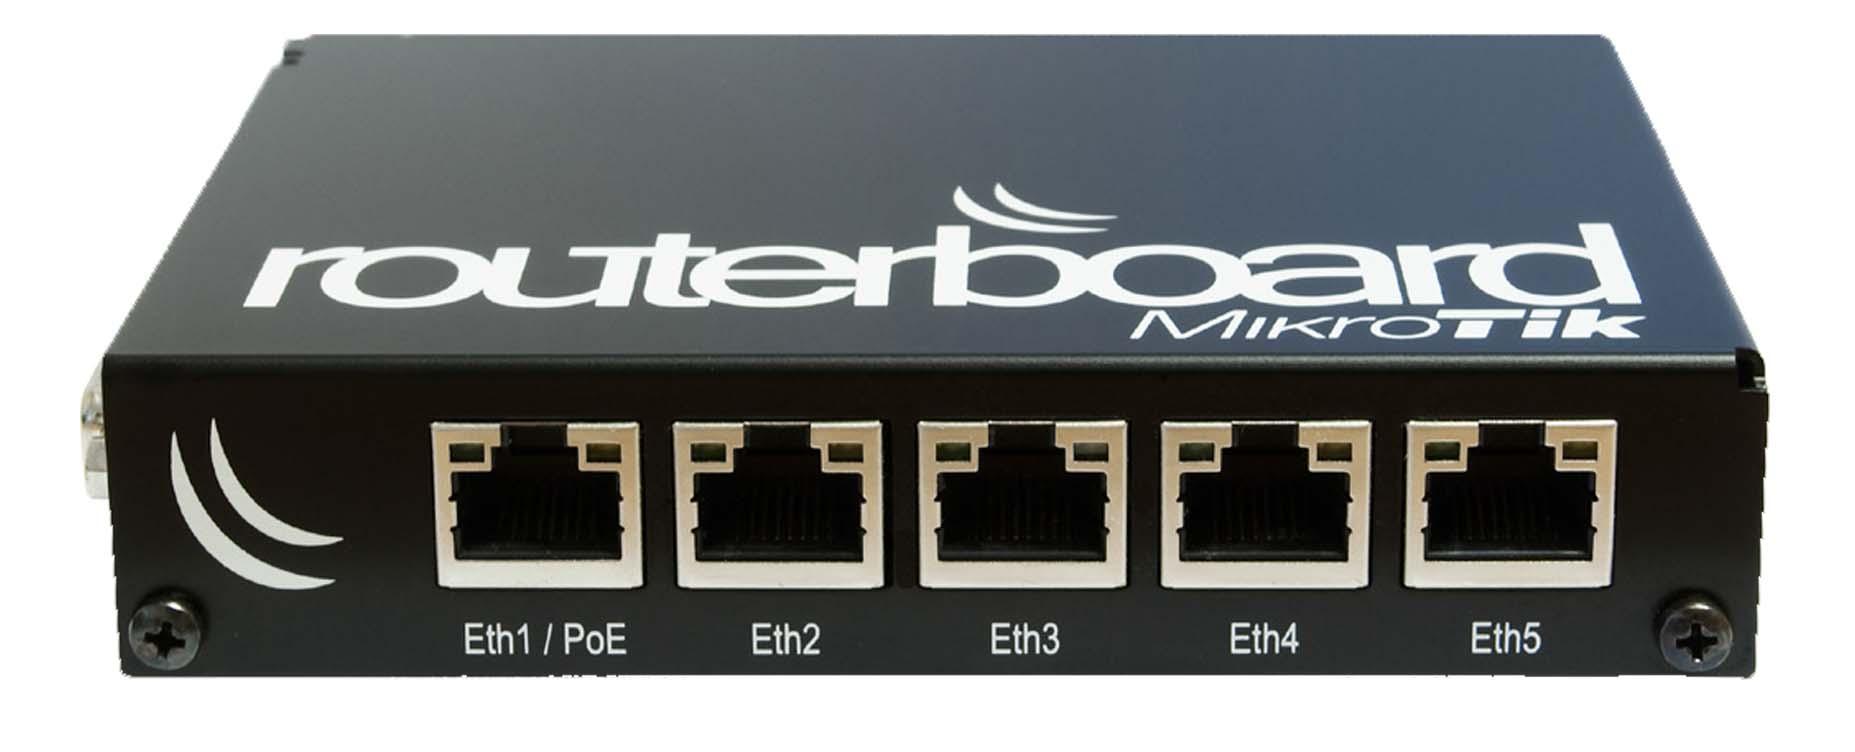 mikrotik rb450g openwrt installation alduras rh alduras com John Deere 450G Dozer routerboard 450g user manual